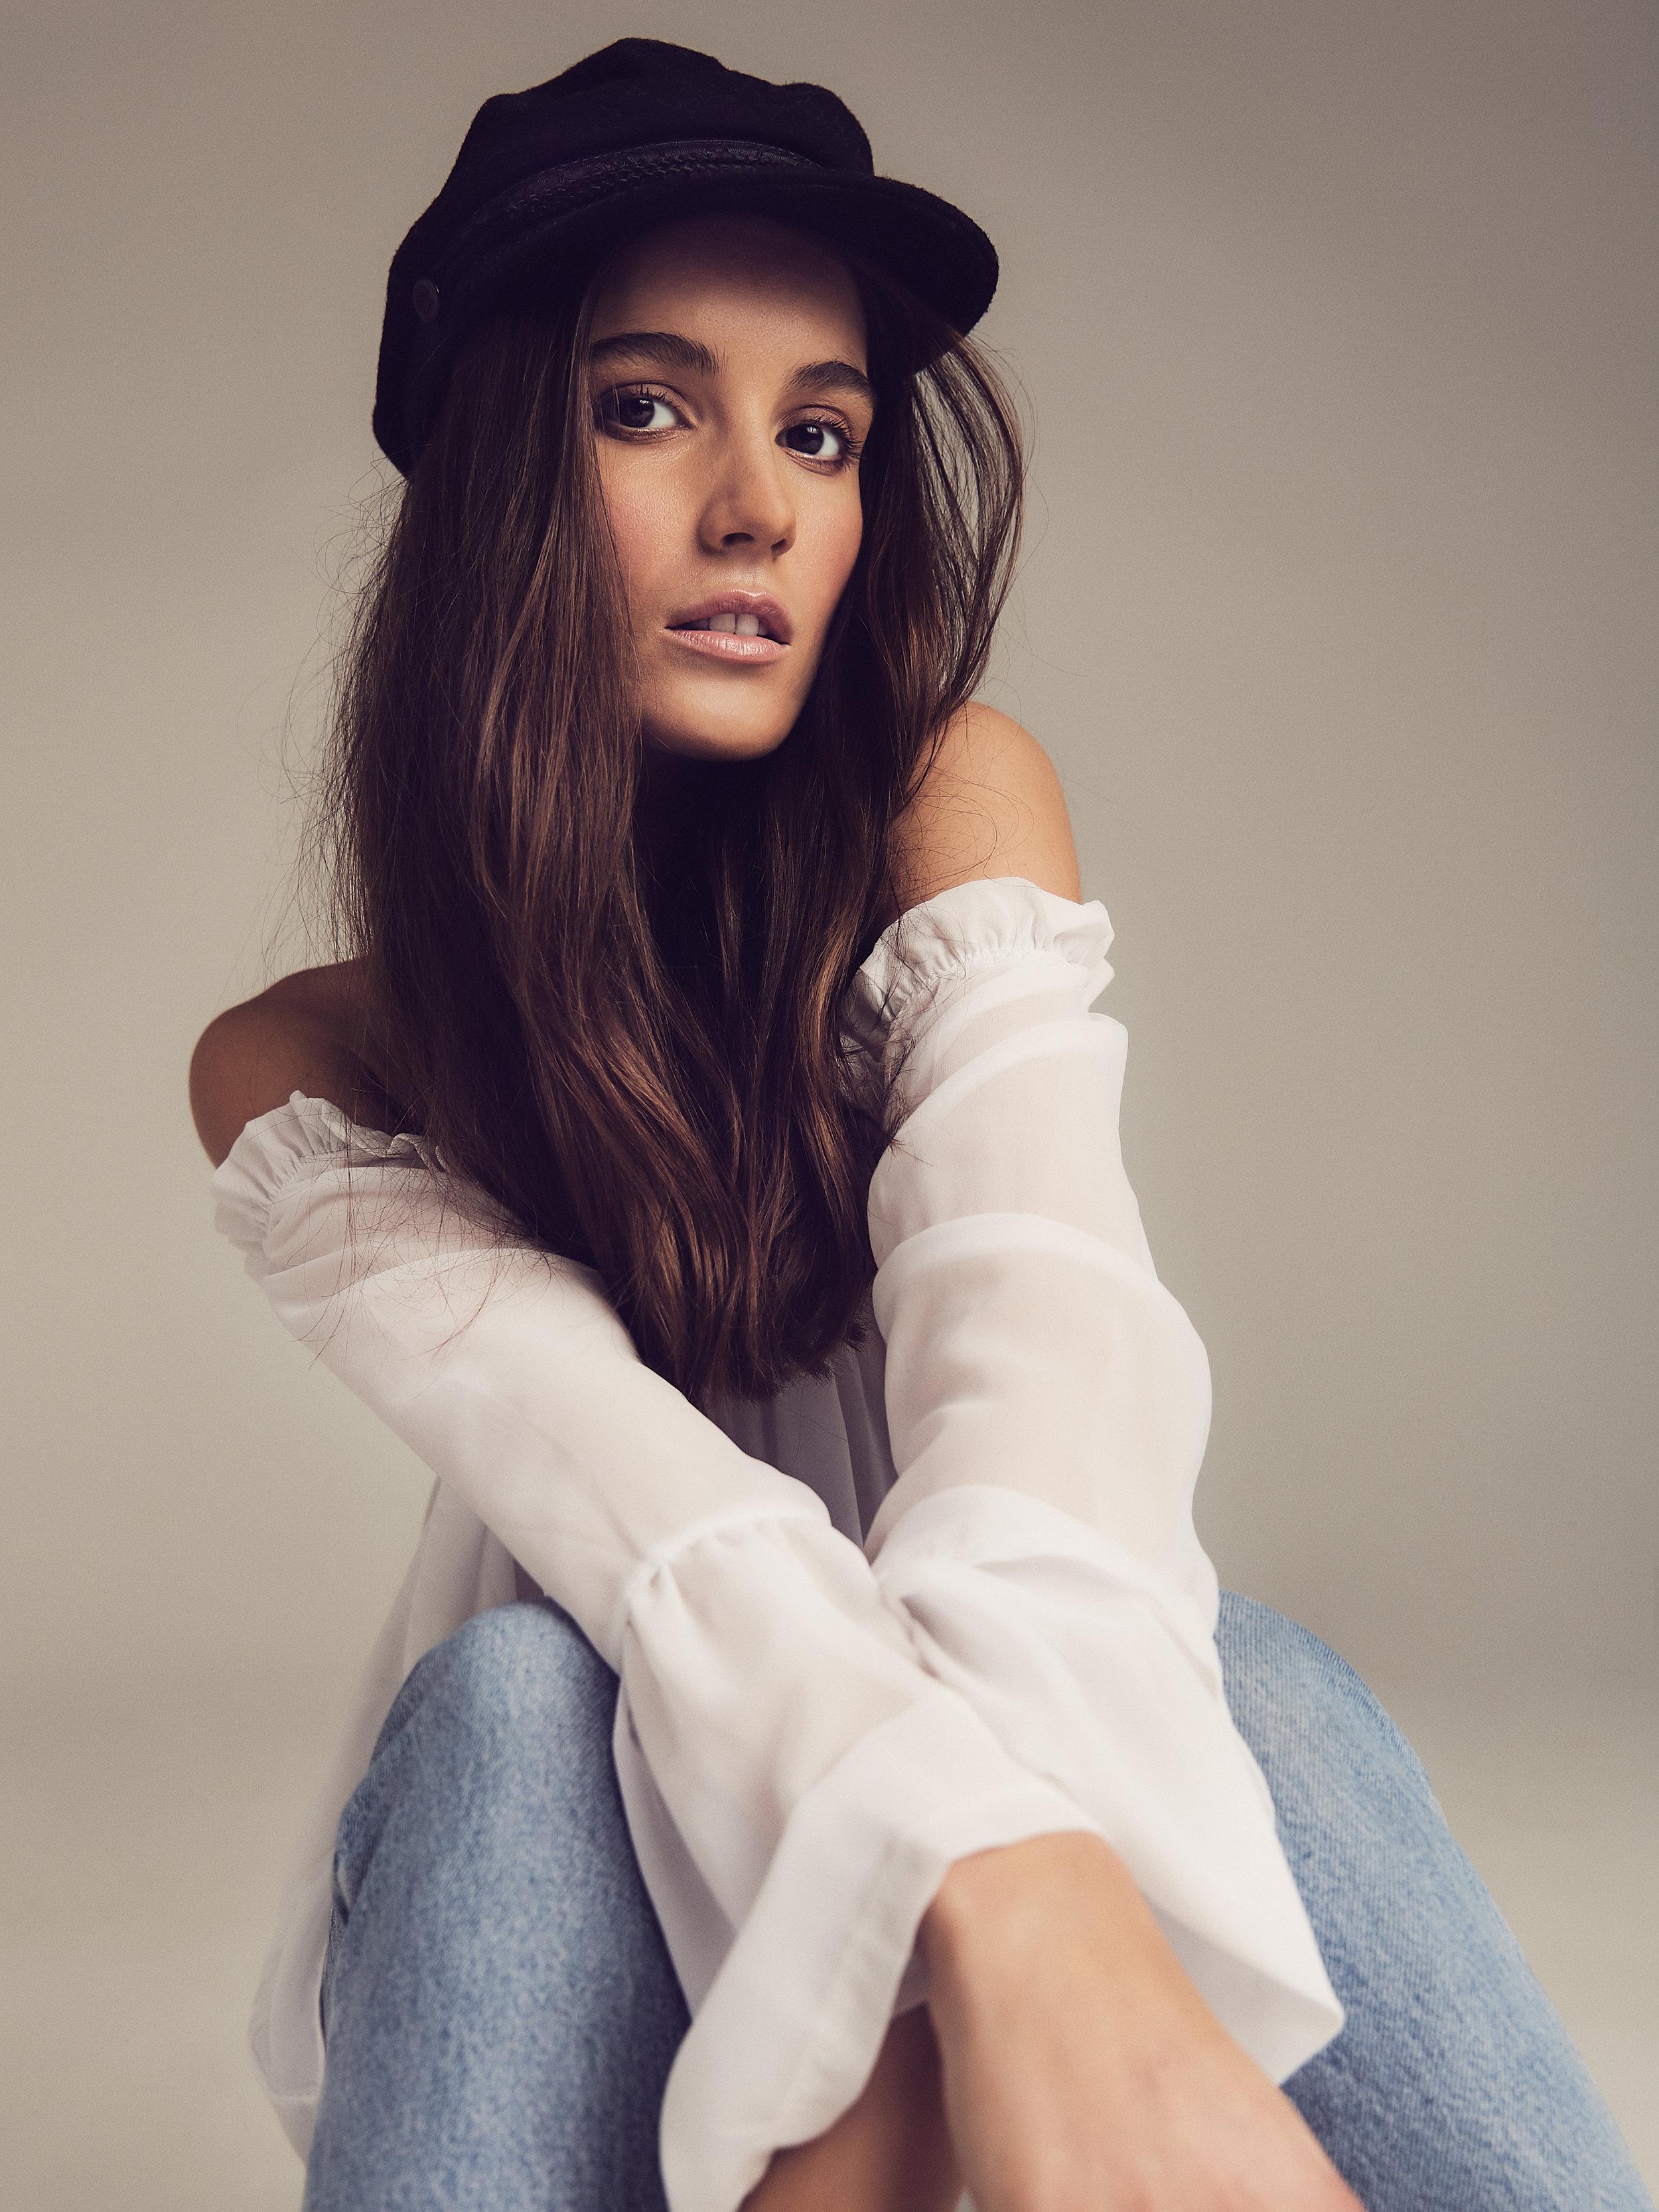 Rachel.Lippet-13.jpg